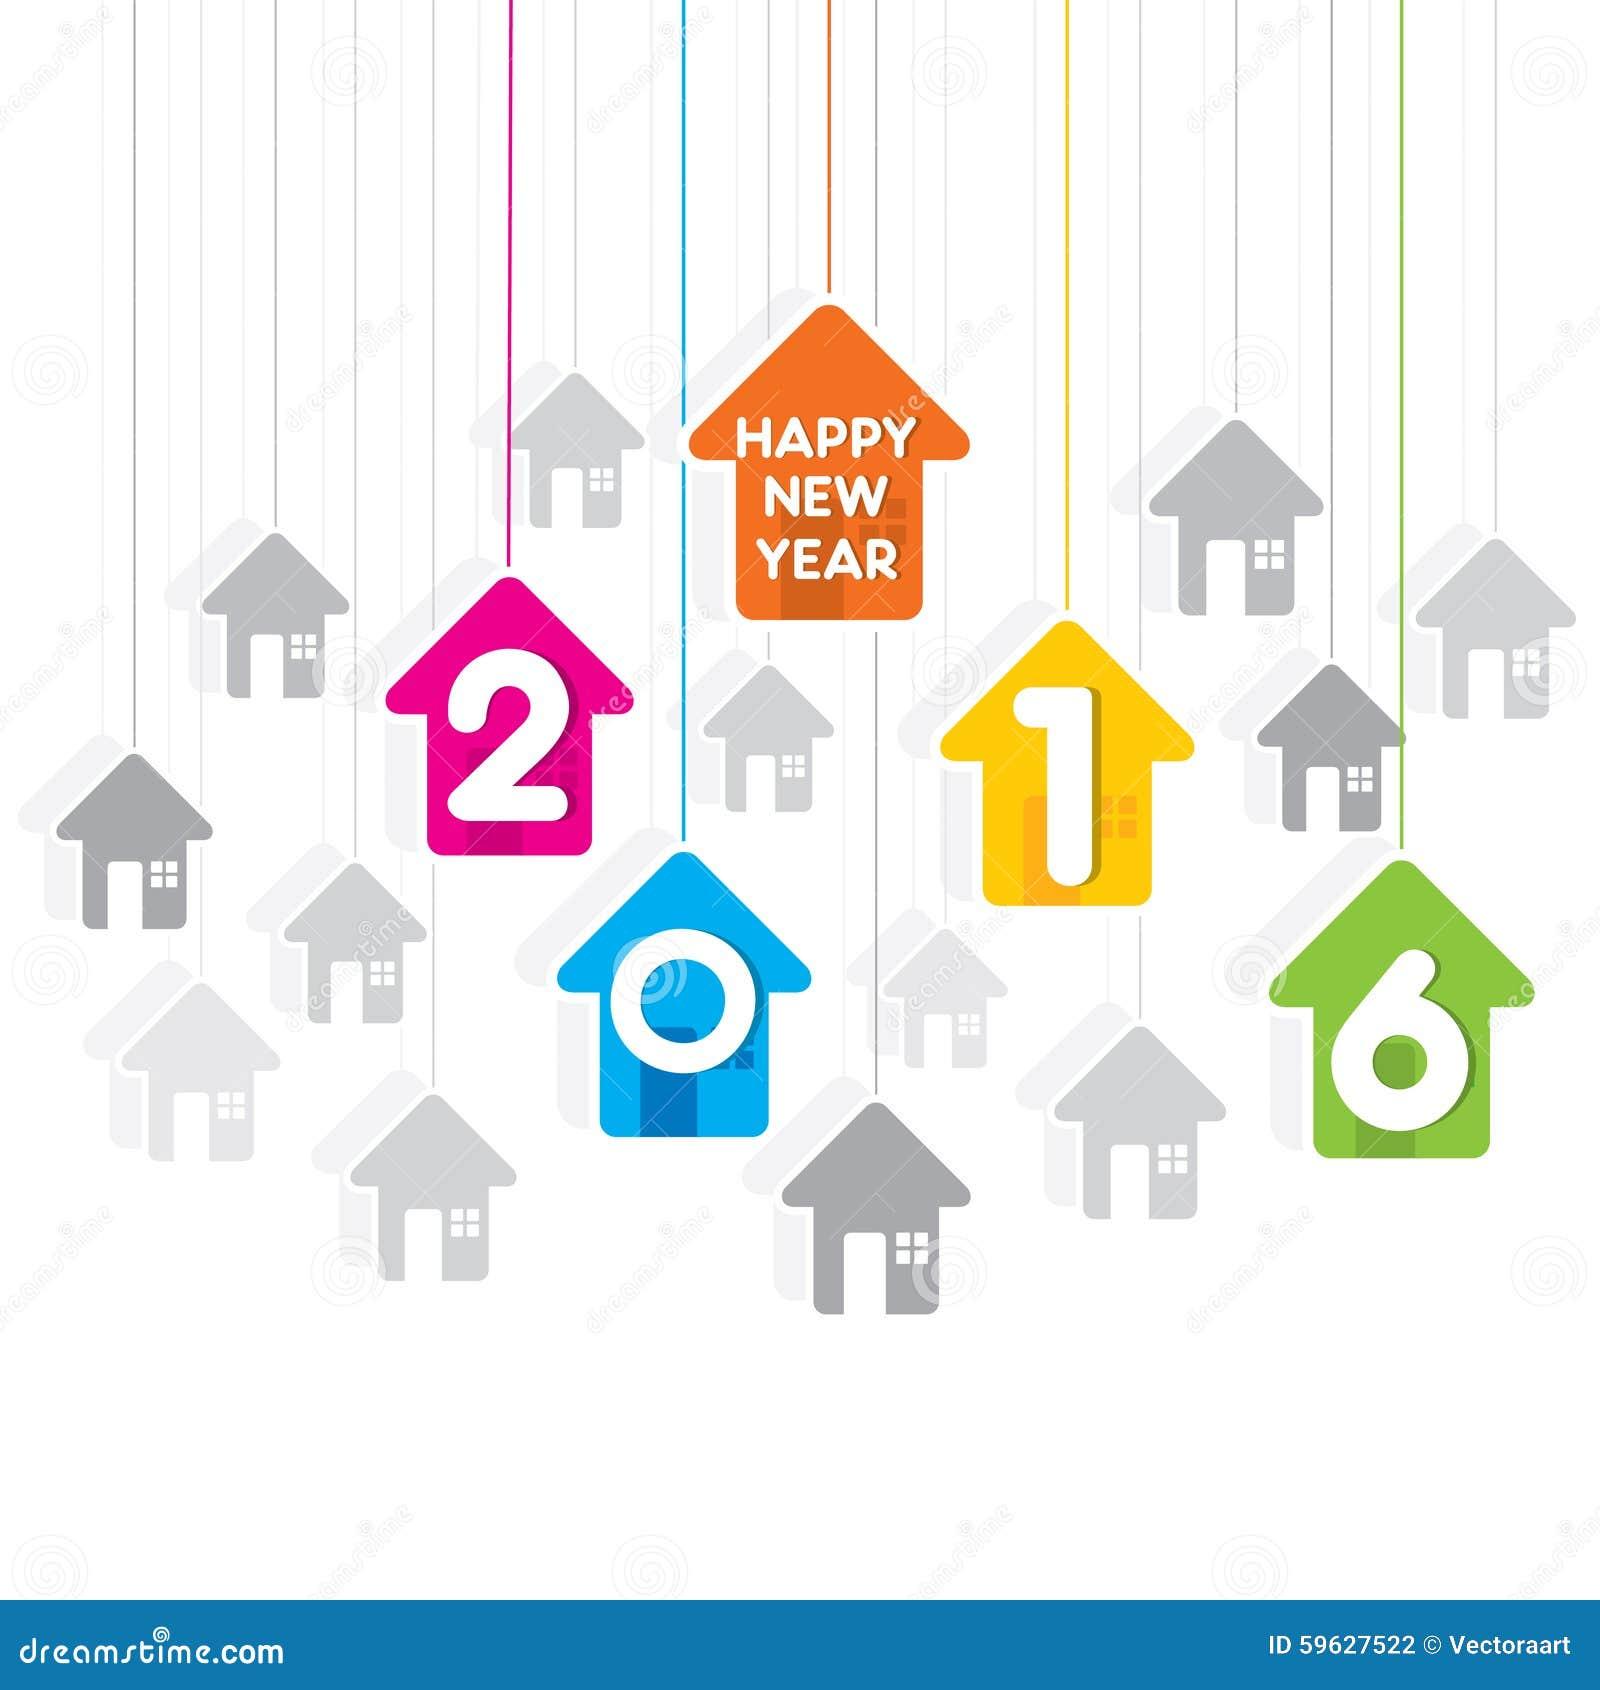 Happy new year 2016 design stock vector illustration of happy new year 2016 design m4hsunfo